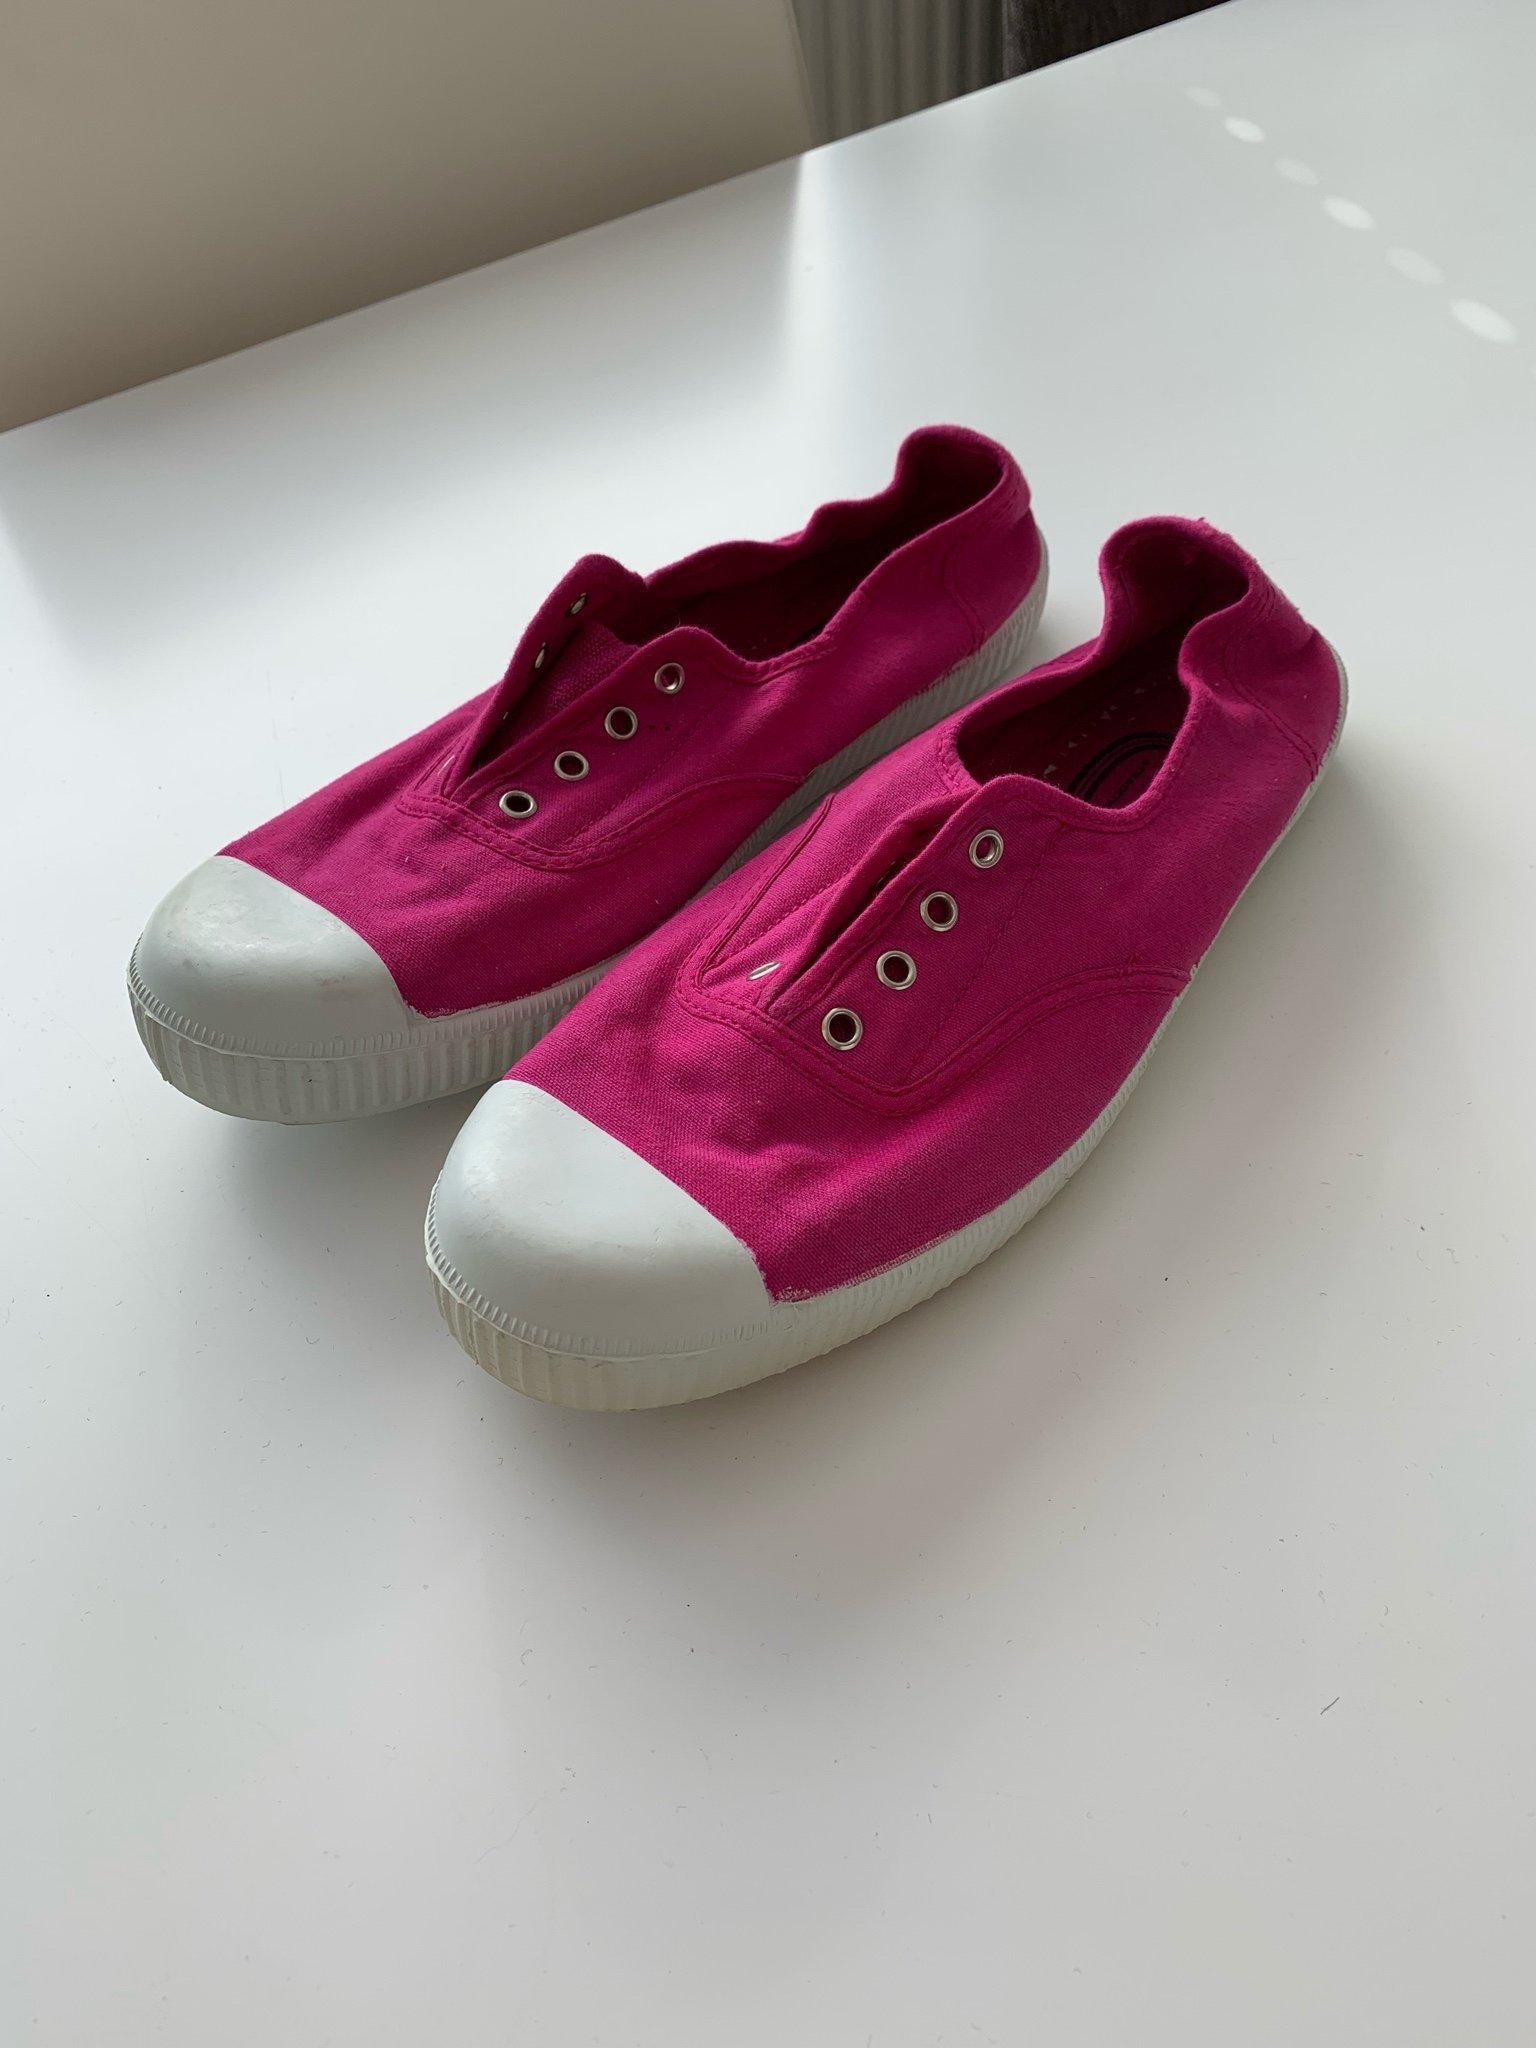 725d320adc8 Chipie tygskor gummisula doftskor skor sneakers. Stlk 38,5-39. Cerise  Nyskick